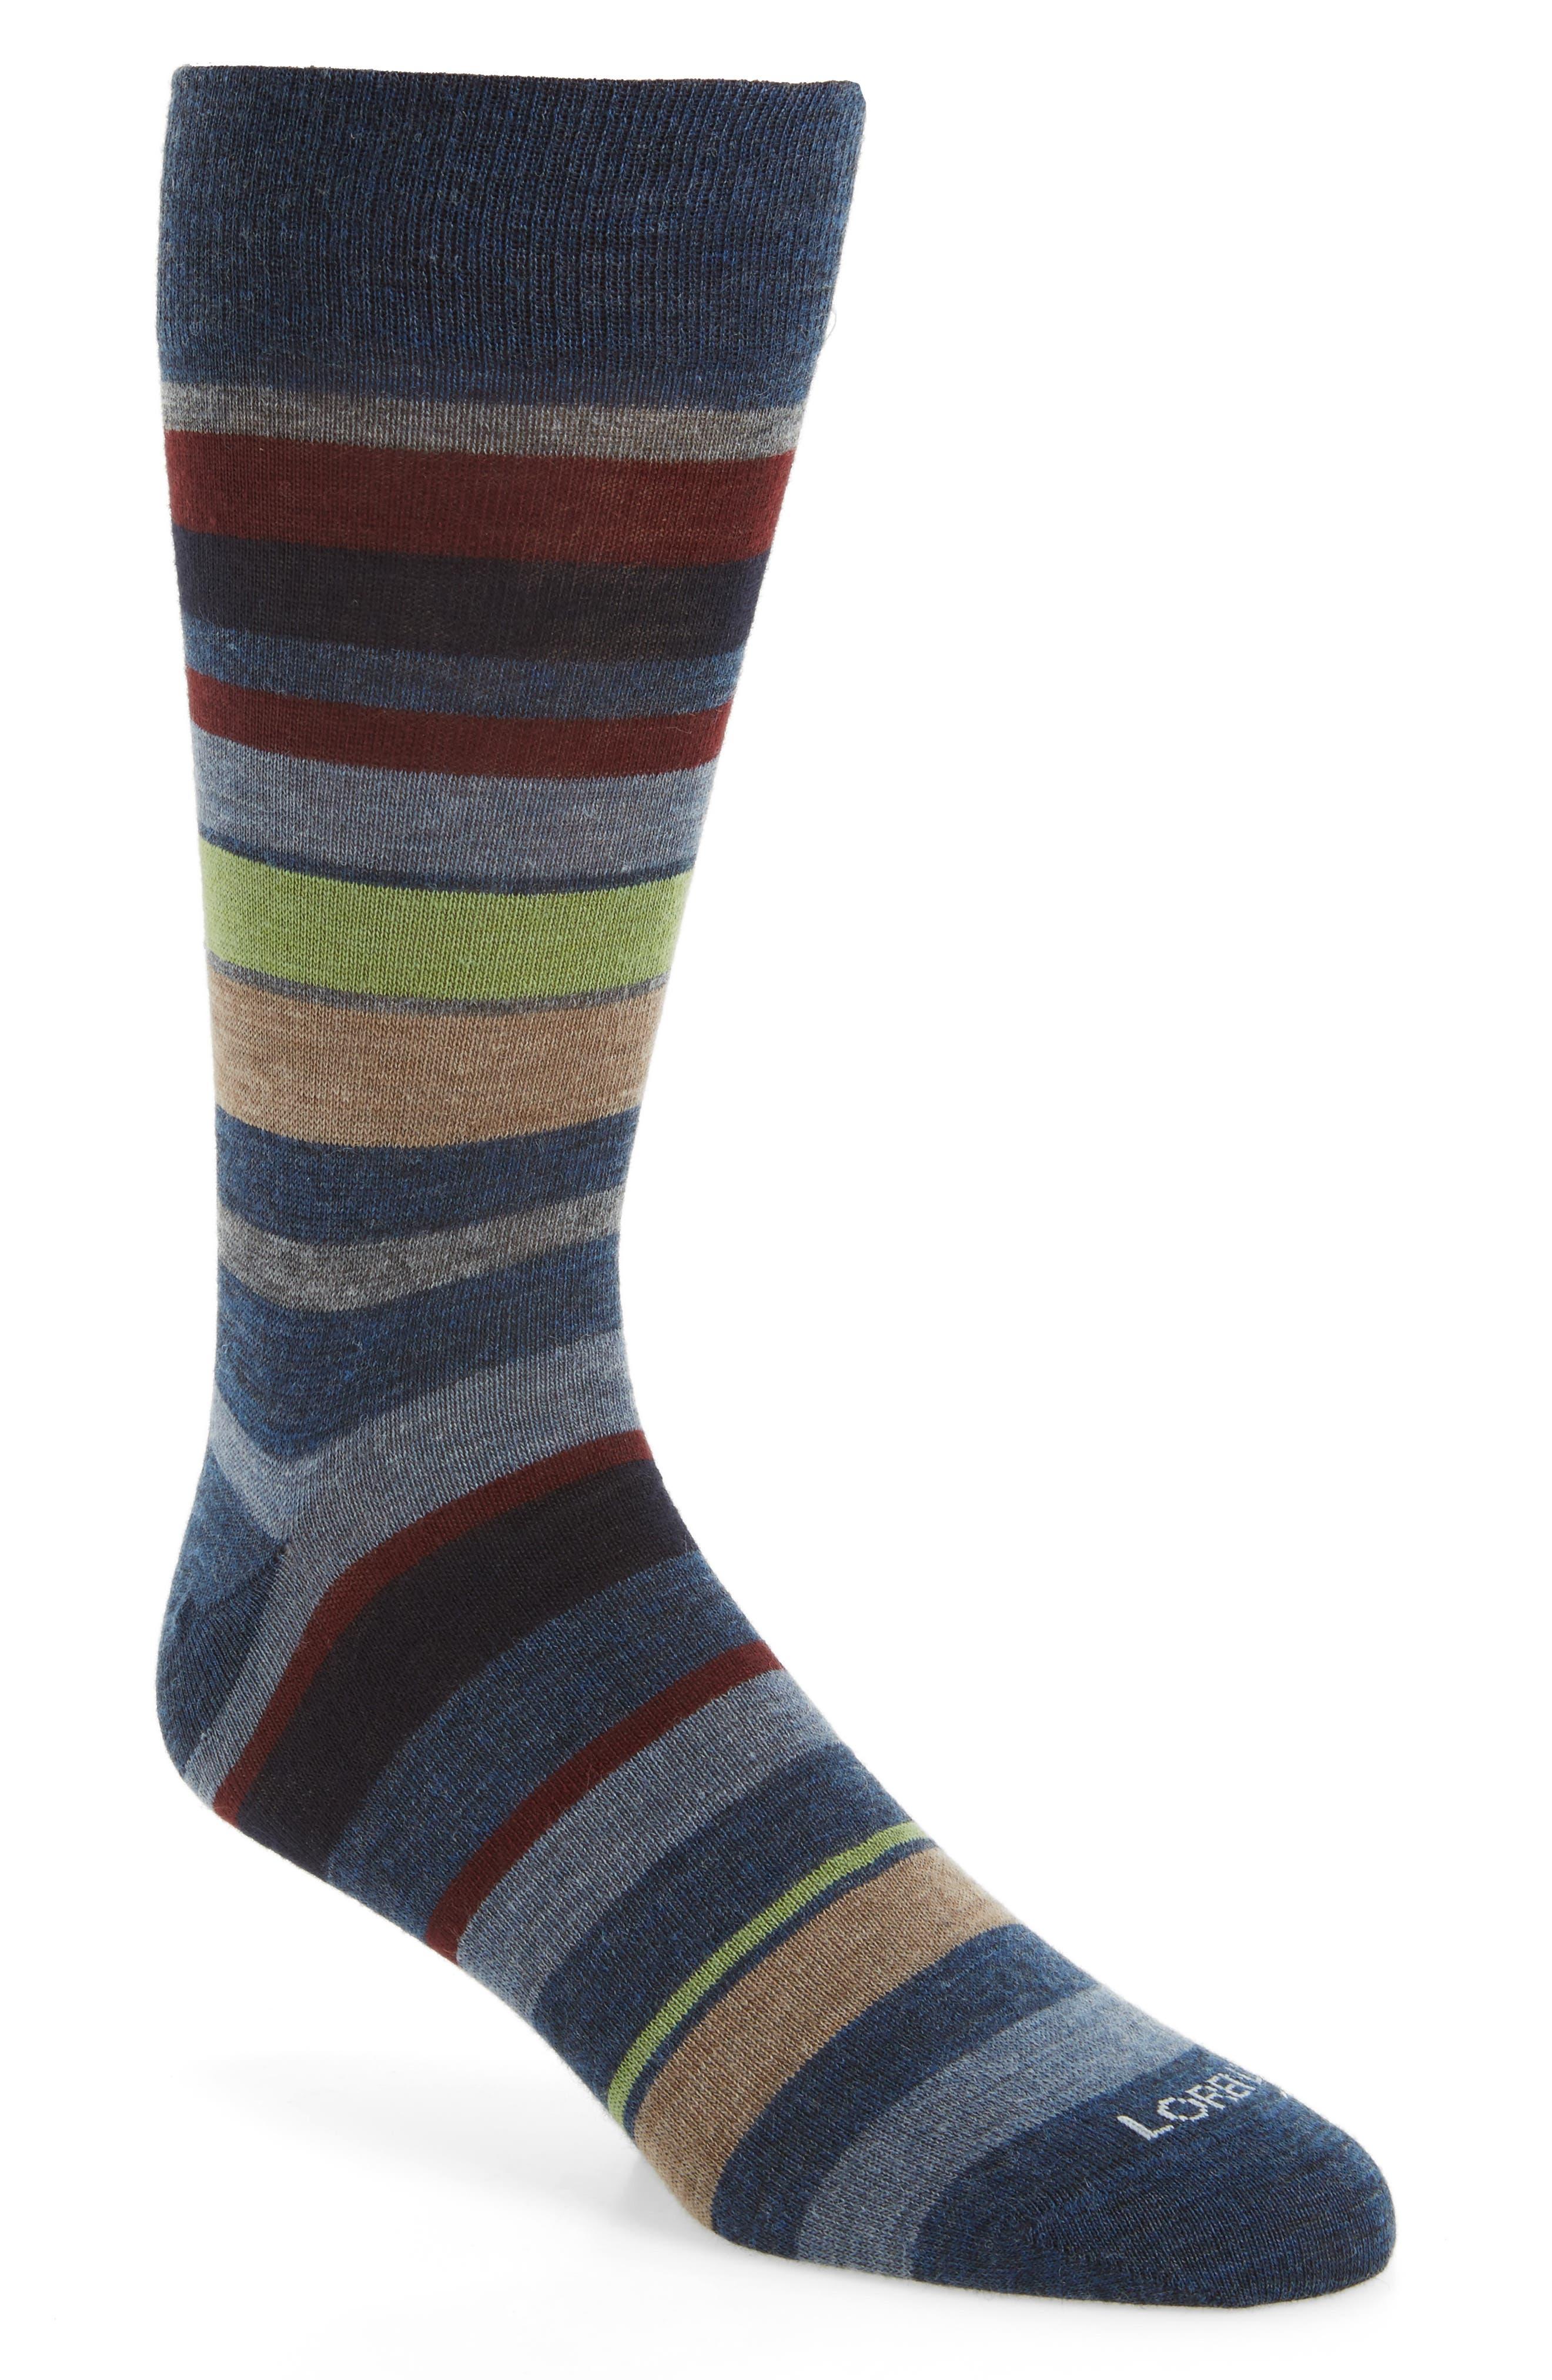 Multistripe Socks,                             Main thumbnail 1, color,                             Denim